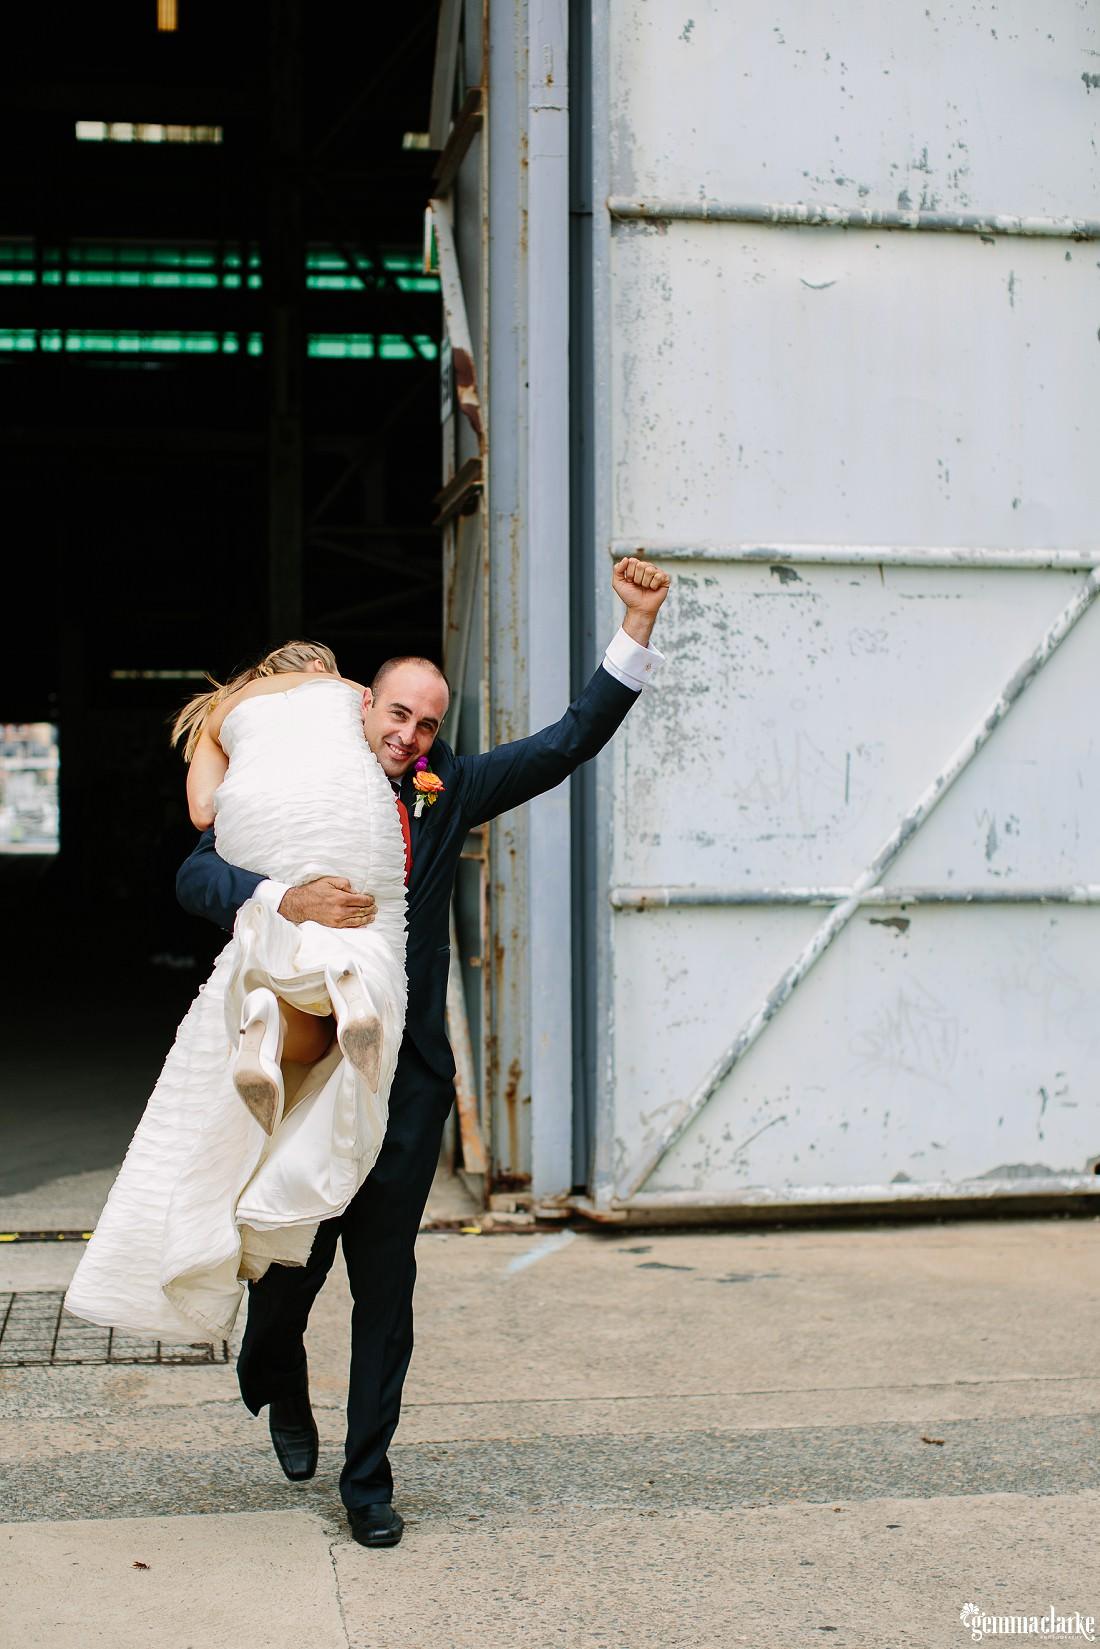 gemmaclarkephotography_cockatoo-island-wedding-photos_the-bar-at-the-end-of-the-wharf_0071